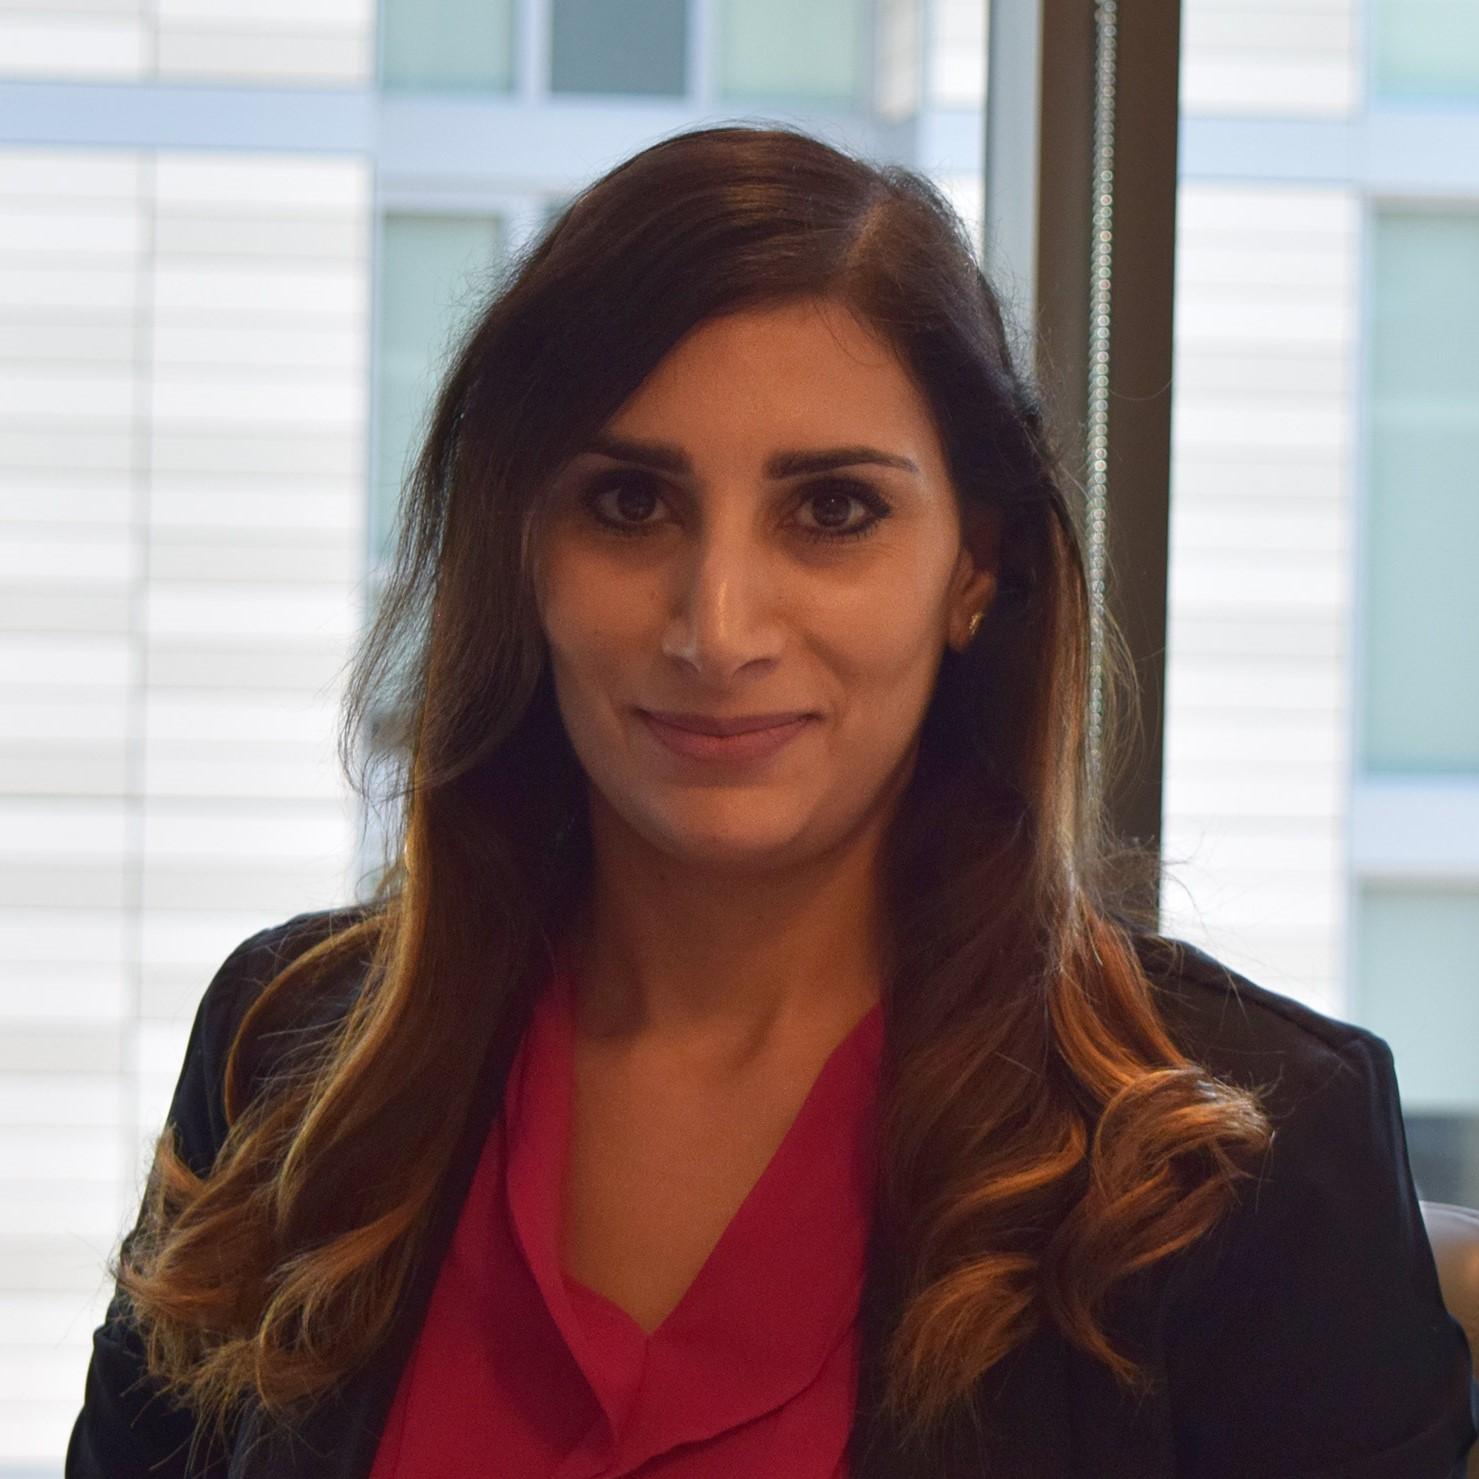 Tamara Kharroub